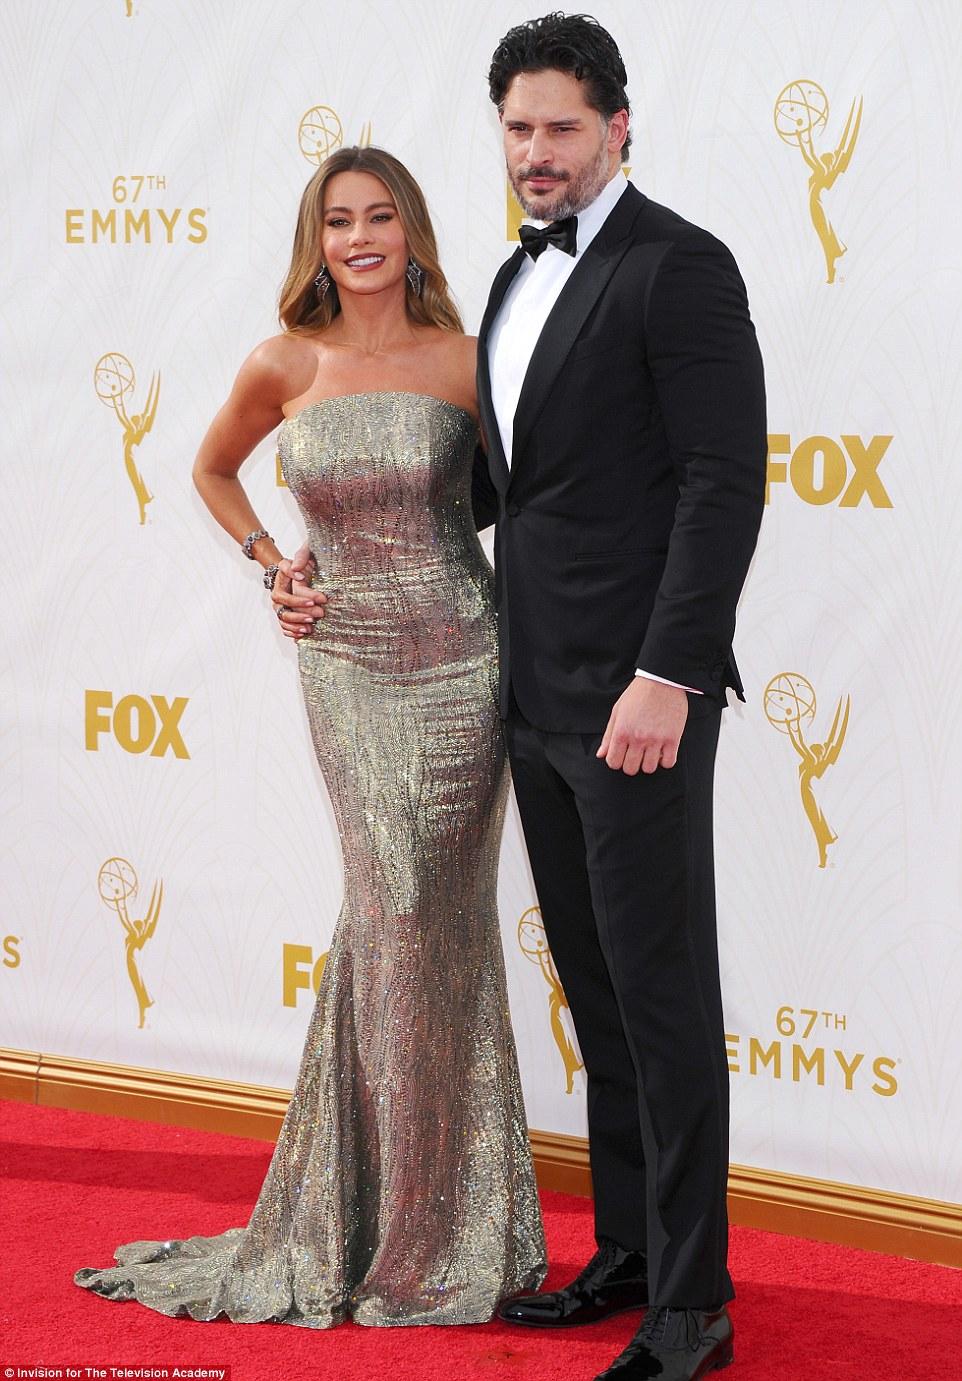 Wow factor: Sofia was accompanied by her handsome fiance Joe Manganiello